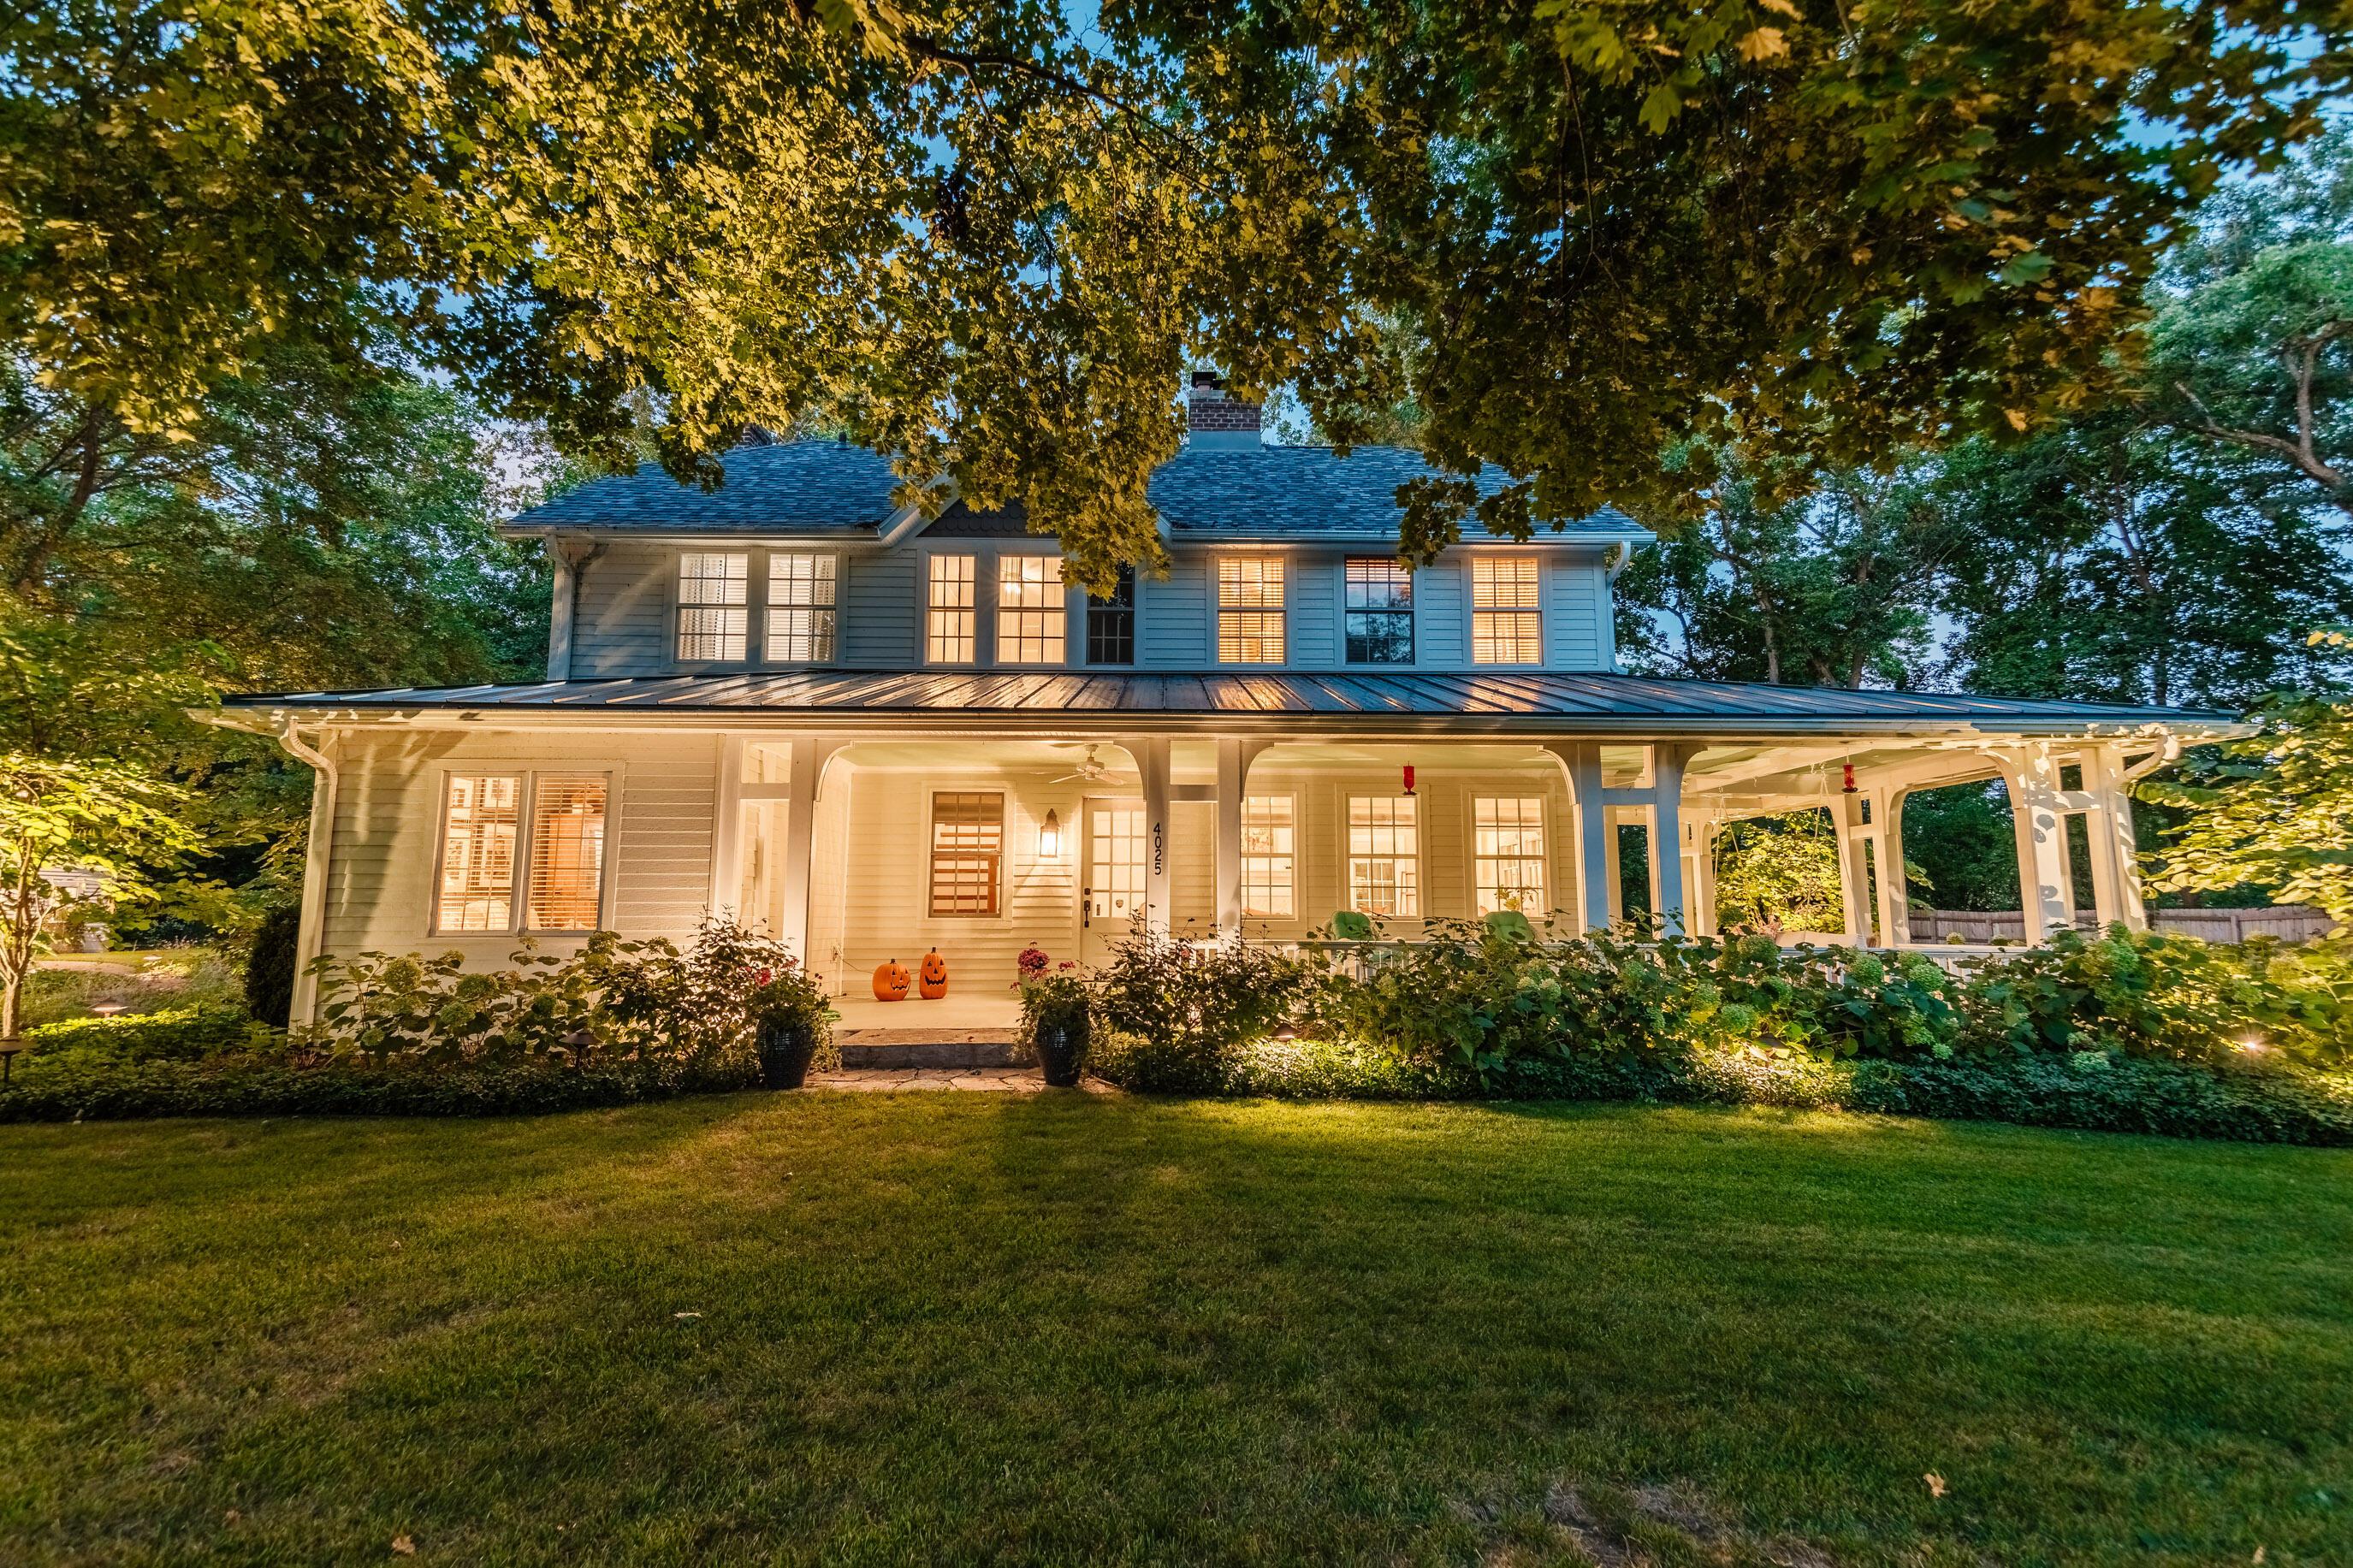 4025 Sawyer Rd, Oconomowoc Lake, Wisconsin 53066, 3 Bedrooms Bedrooms, 12 Rooms Rooms,3 BathroomsBathrooms,Single-Family,For Sale,Sawyer Rd,1765963